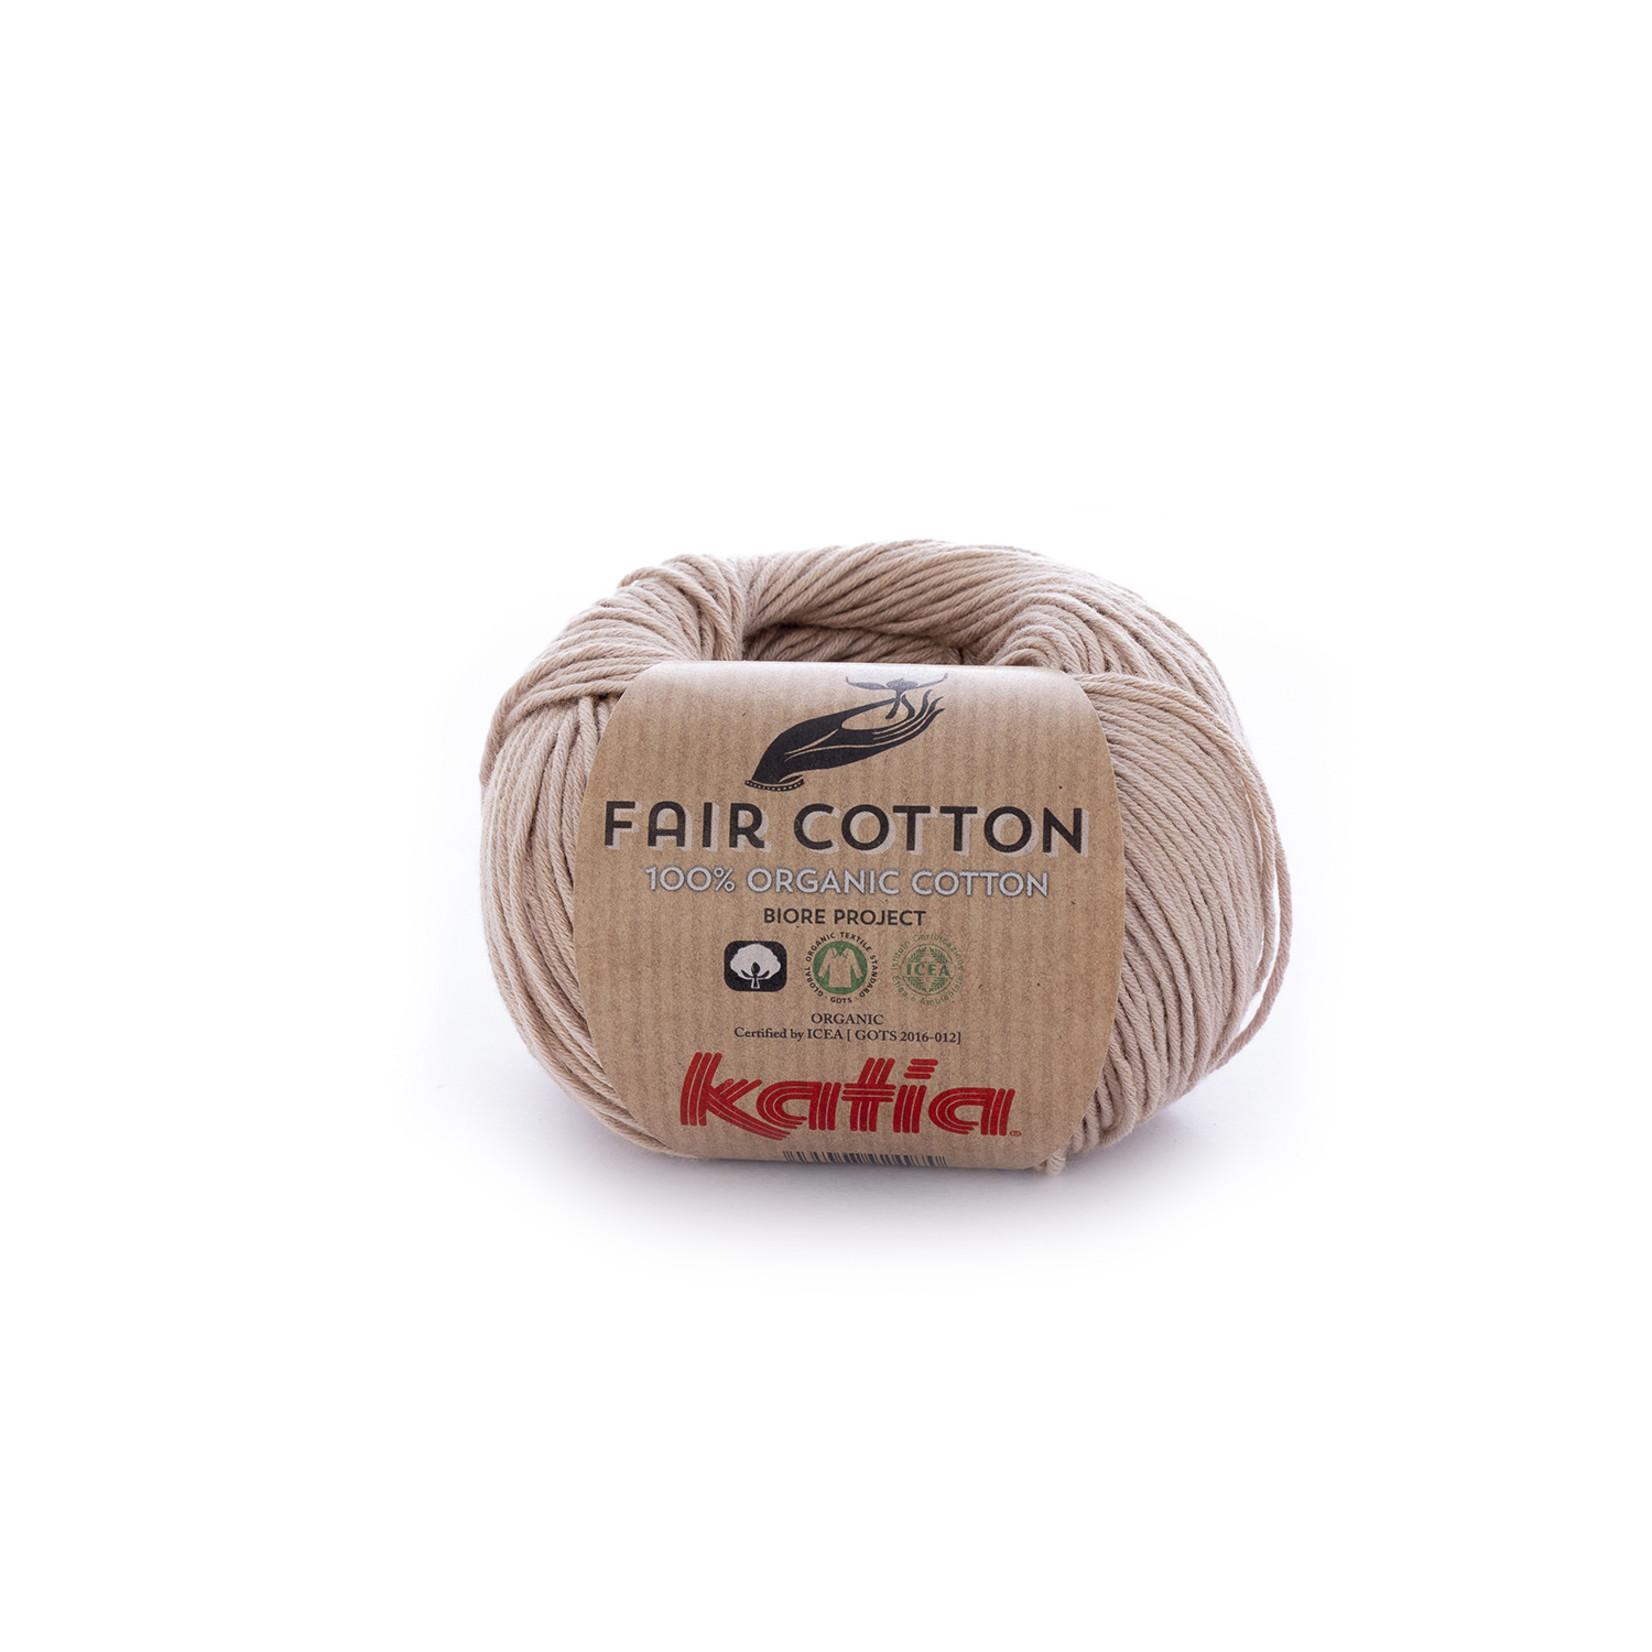 Katia Katia Fair Cotton 12 - sepiabruin - 1 bol = 50 gr. = 155 m. - 100% biol. katoen